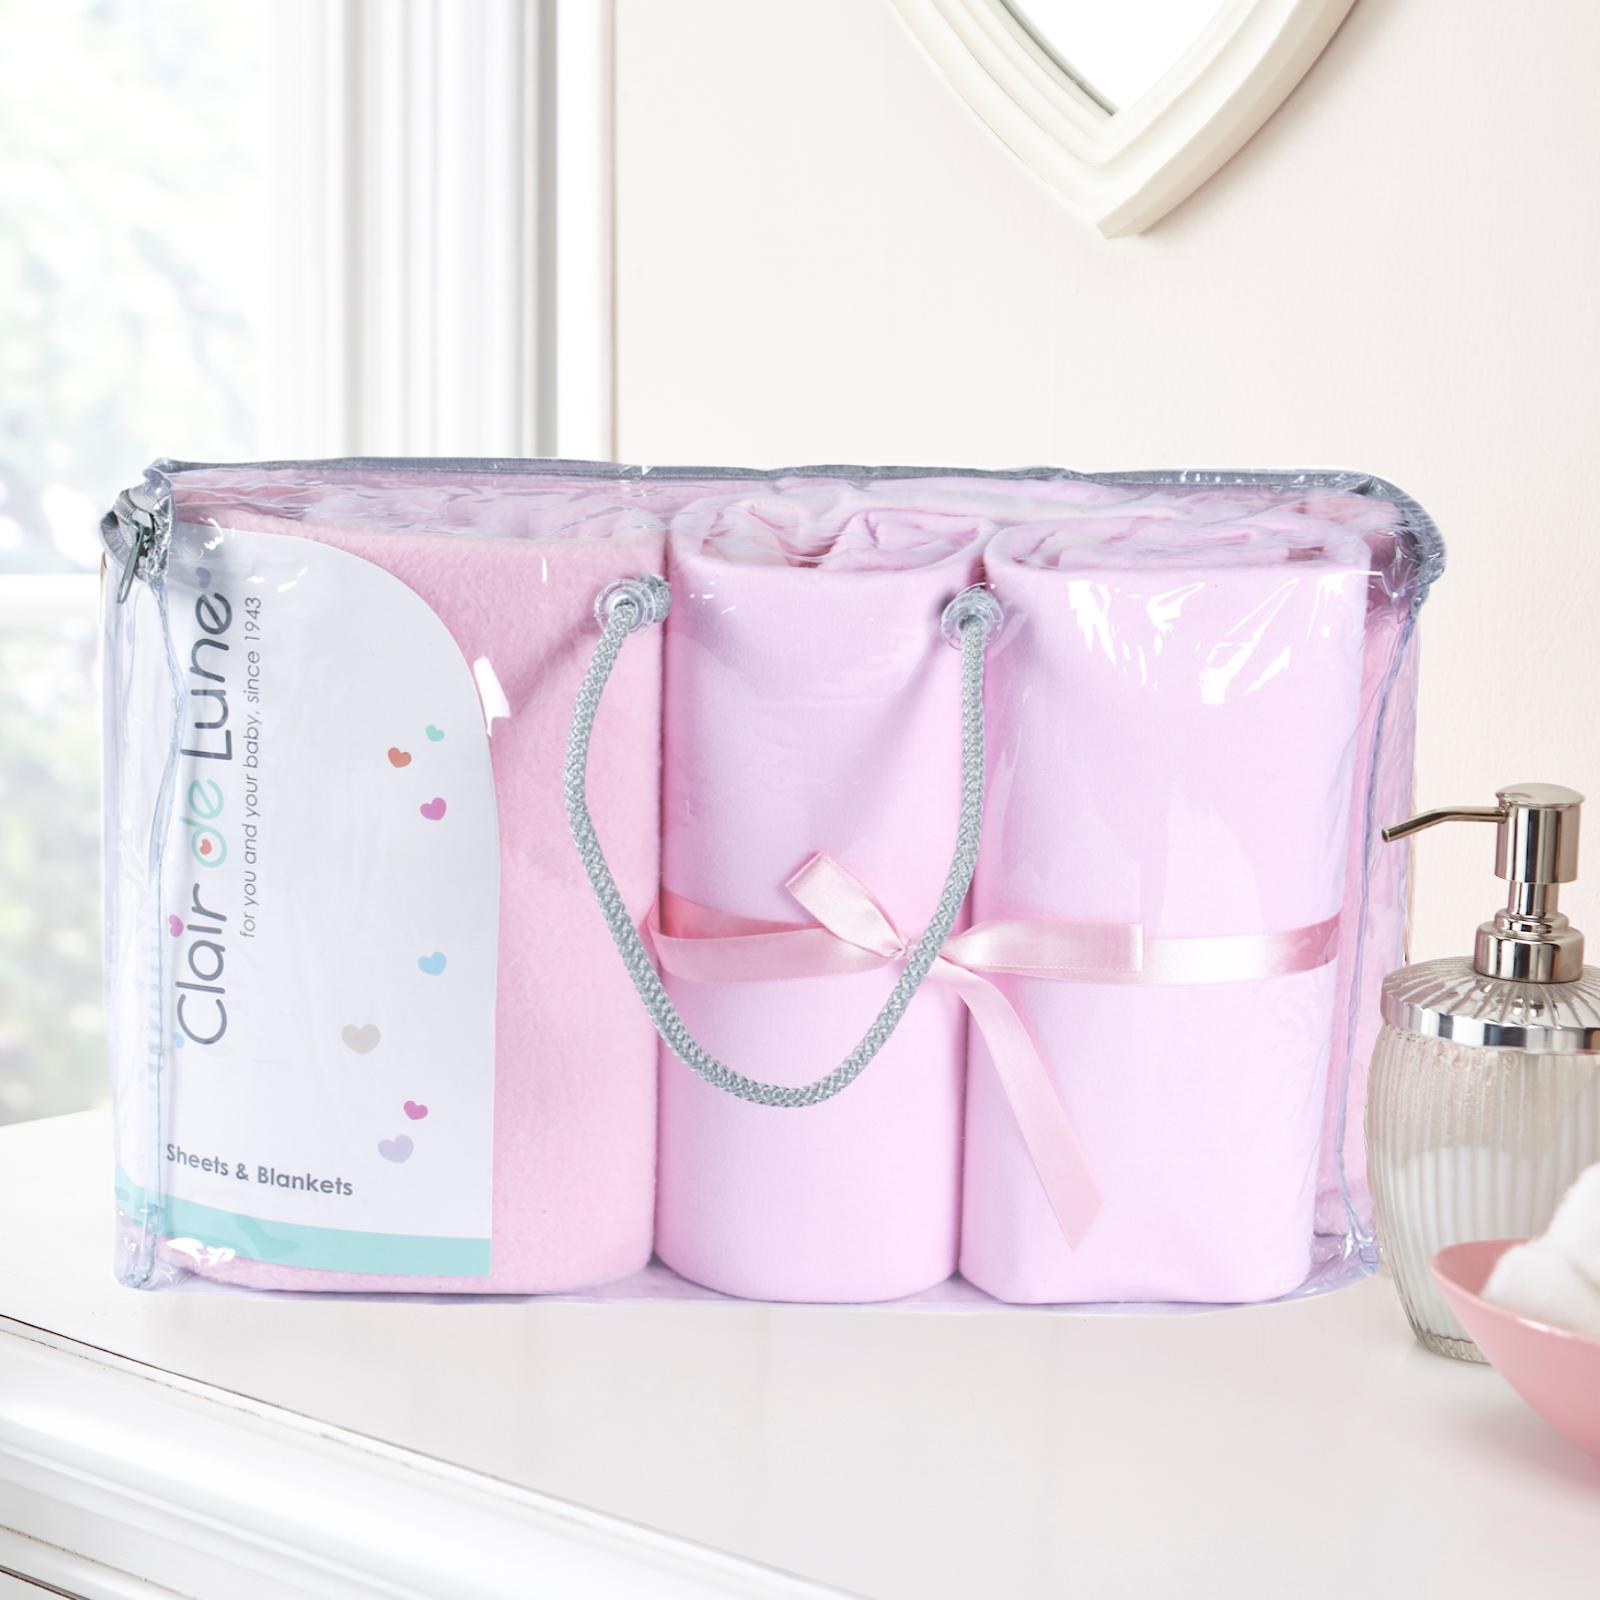 Clair De Lune 3 Piece Cot Bed Bedding Bale Gift Set Pink